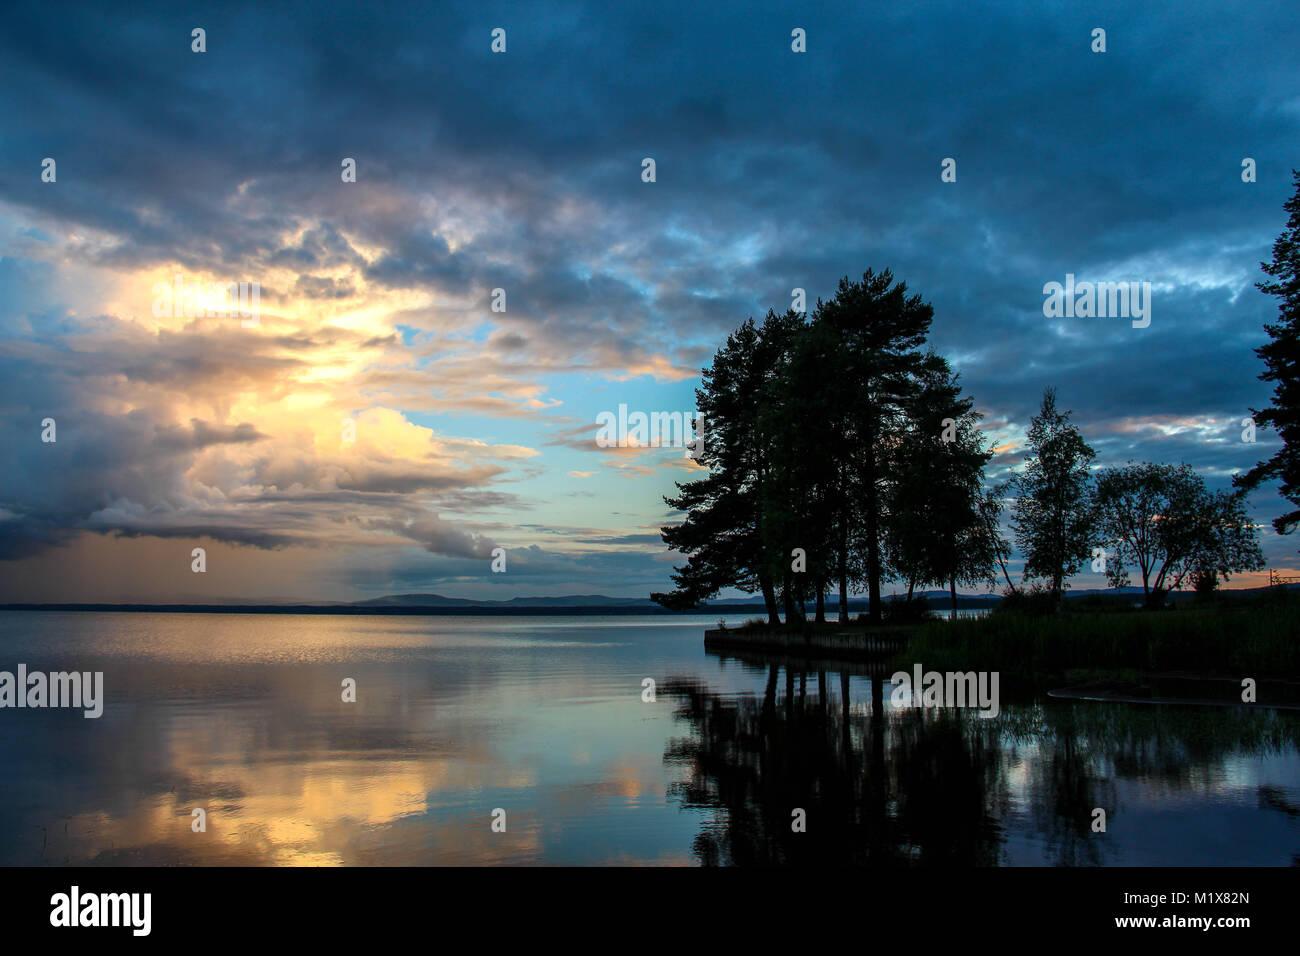 Sunset by Orsa Lake in Dalarna, Sweden. Stock Photo